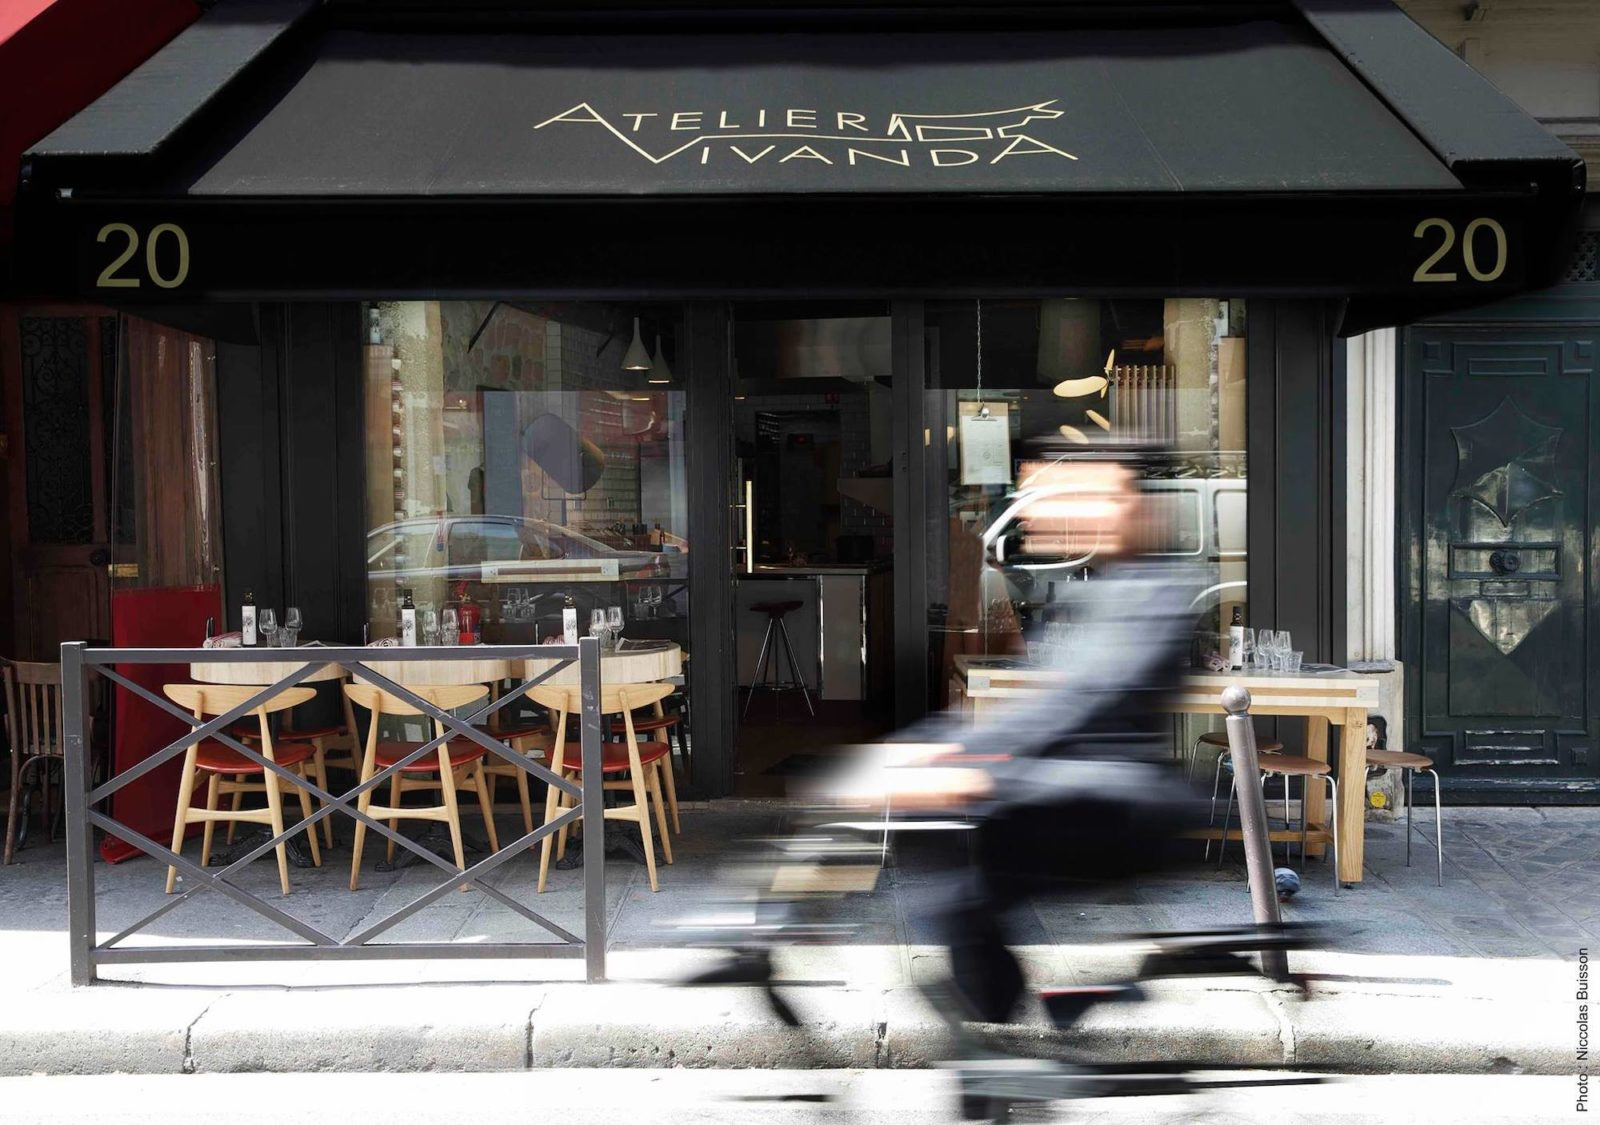 The terrace at Atelier Vivanda restaurant on rue du Cherche-Midi in Paris.